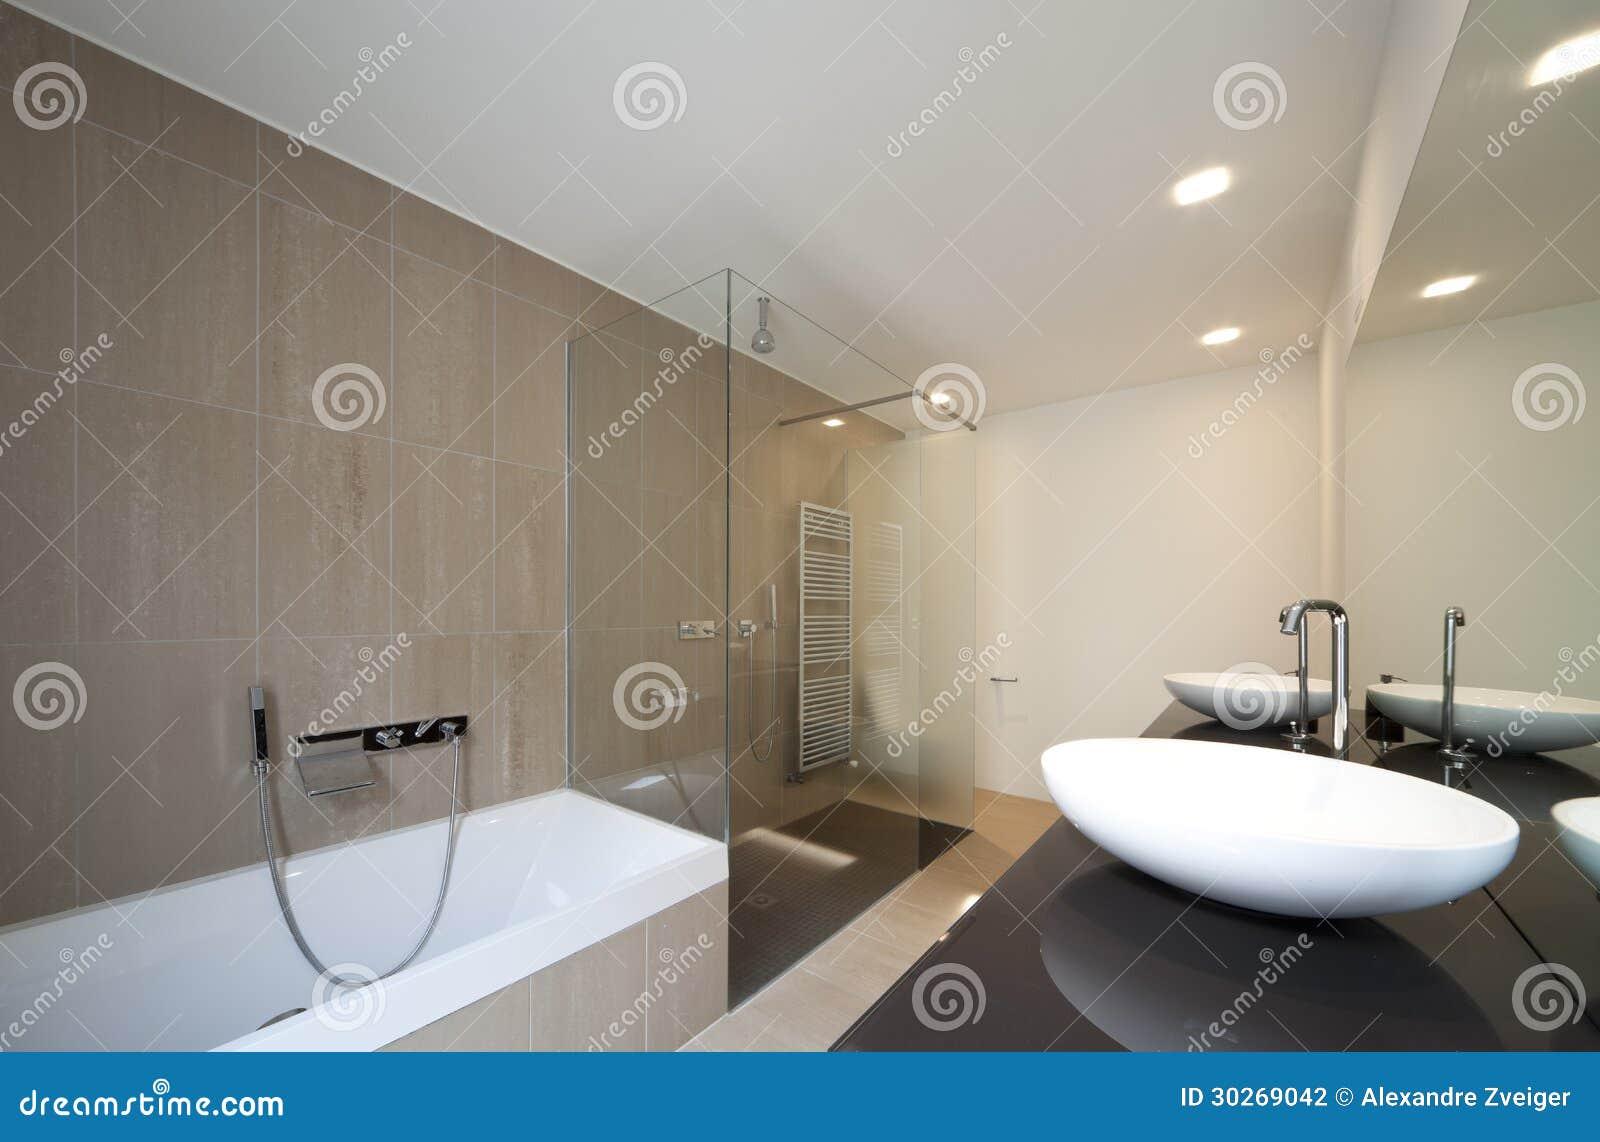 Interieur Maison Modern : Modern house interior stock photo. image of architecture 30269042